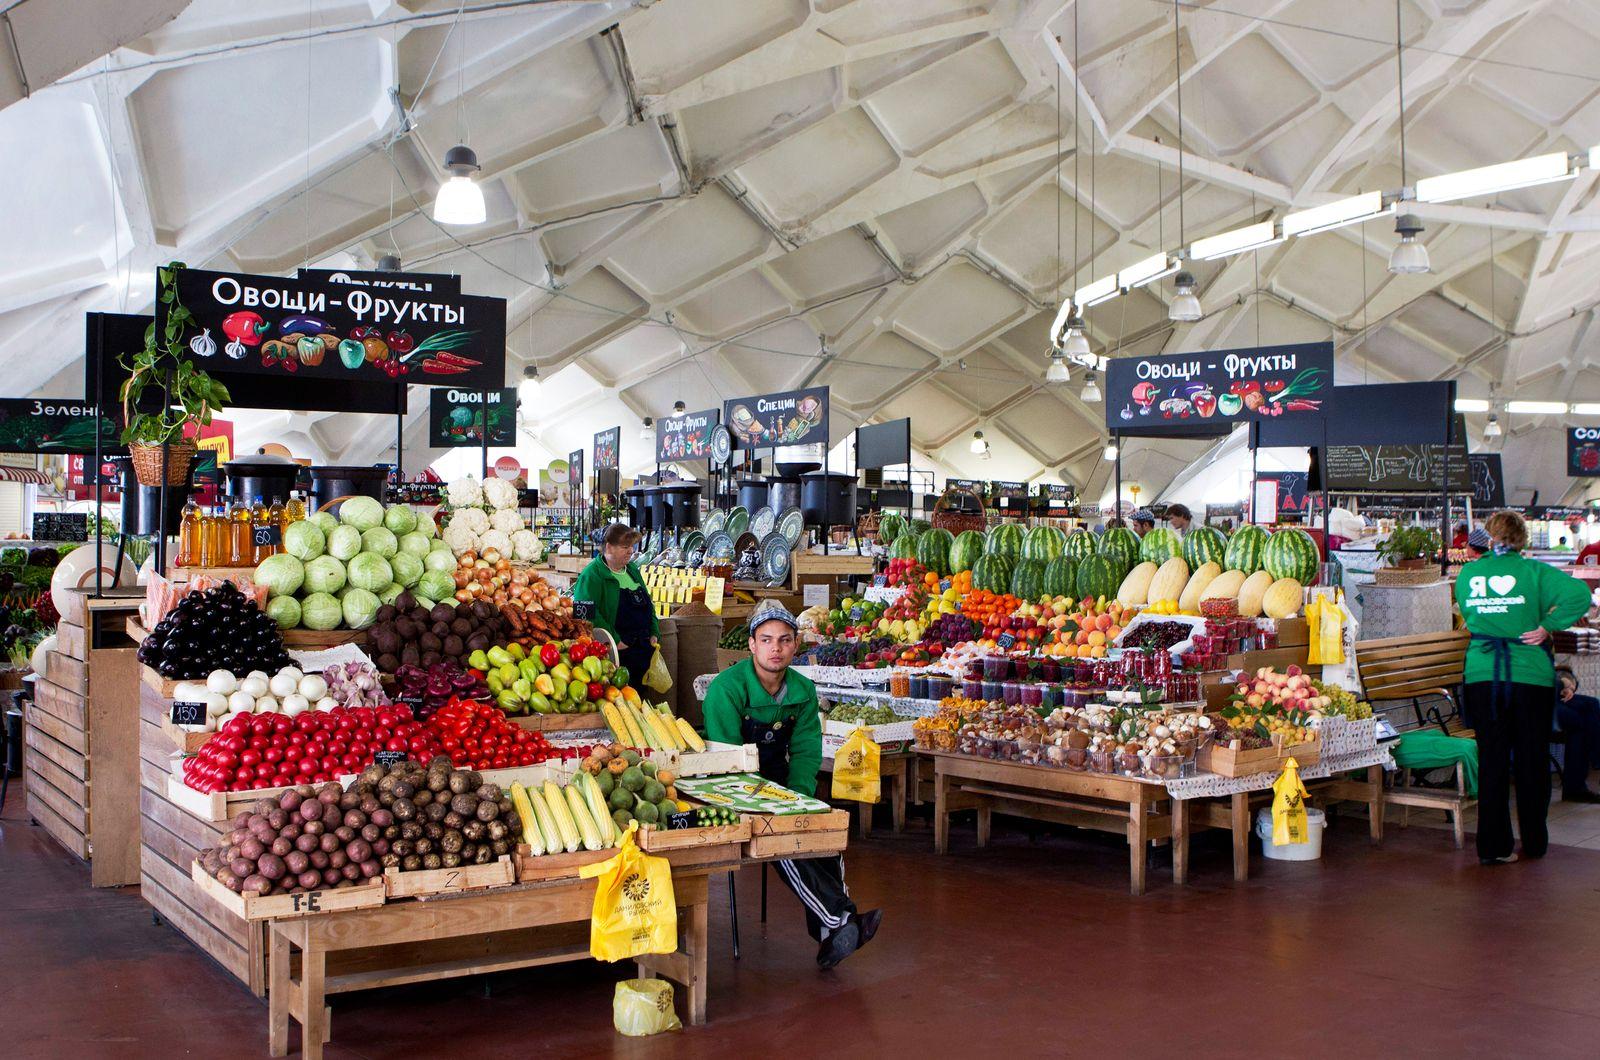 Russland / Markt / Obst Gemüse